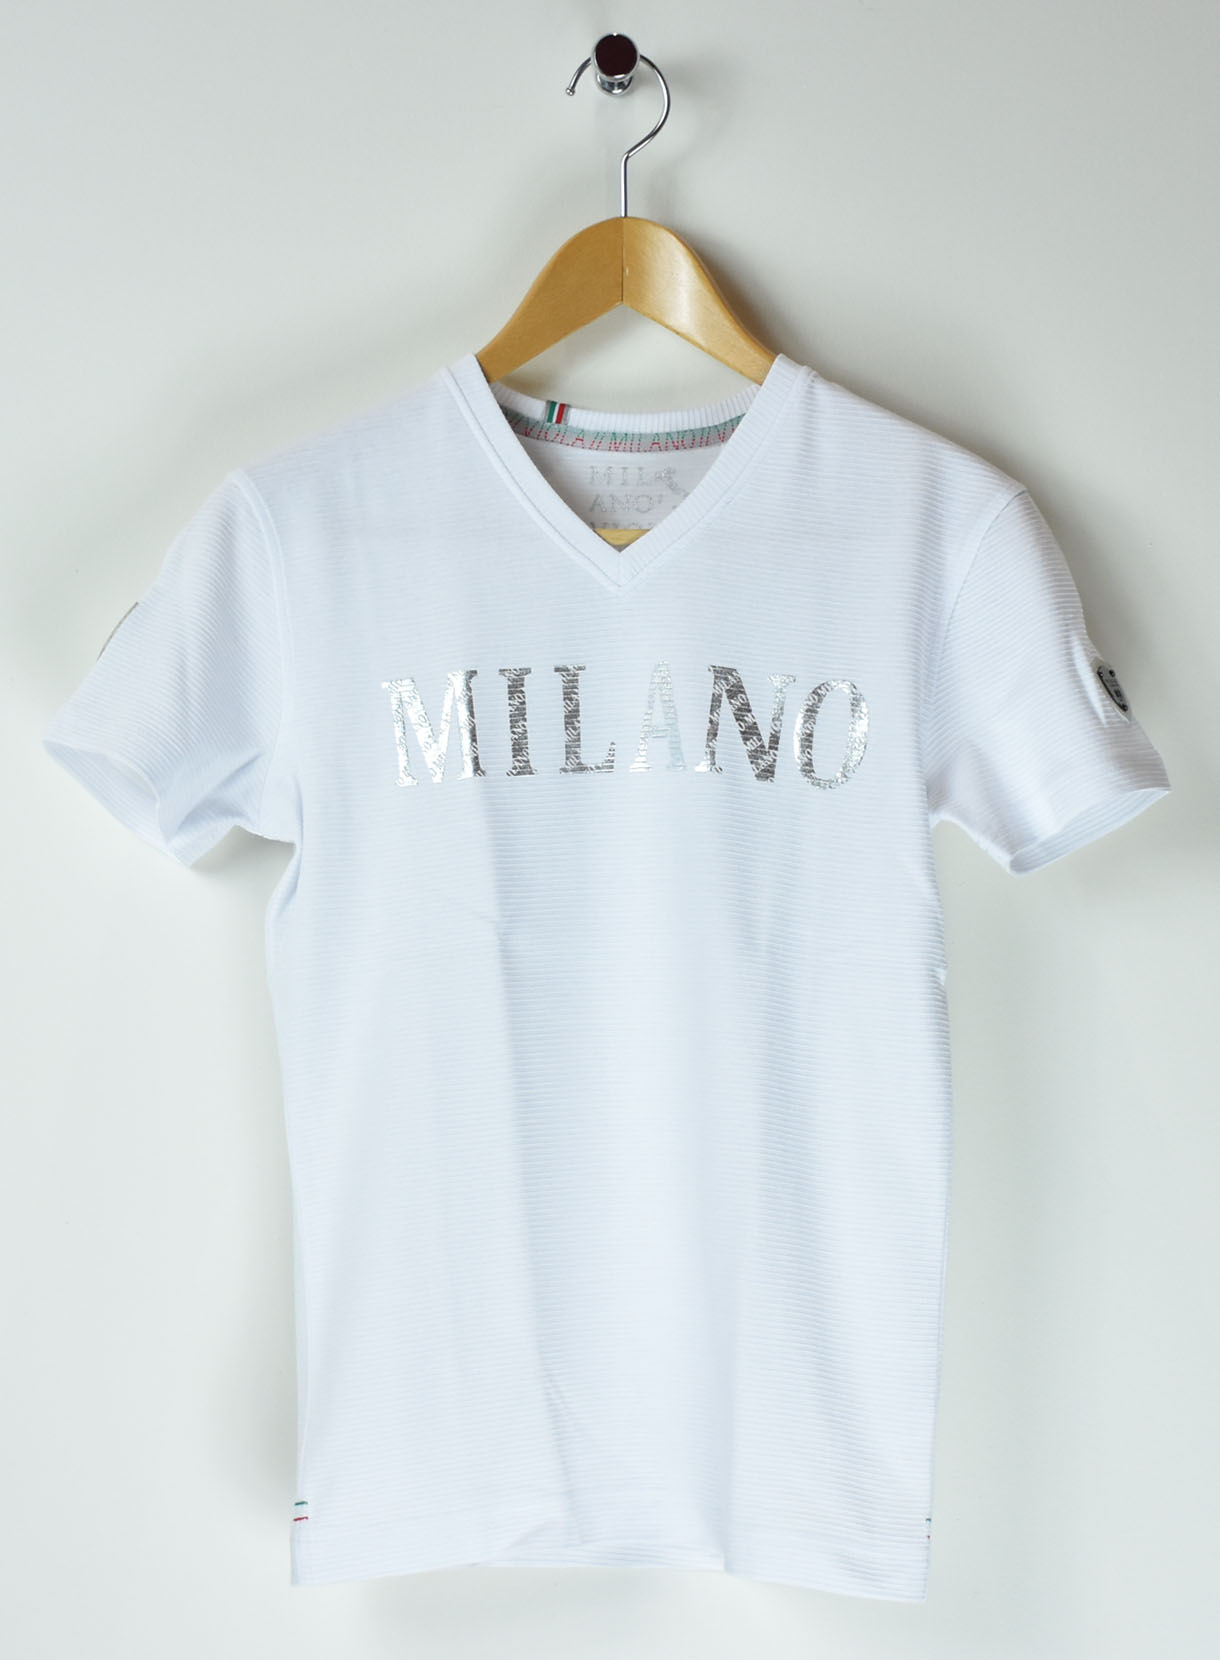 VIOLAスタンプ箔プリントTシャツ